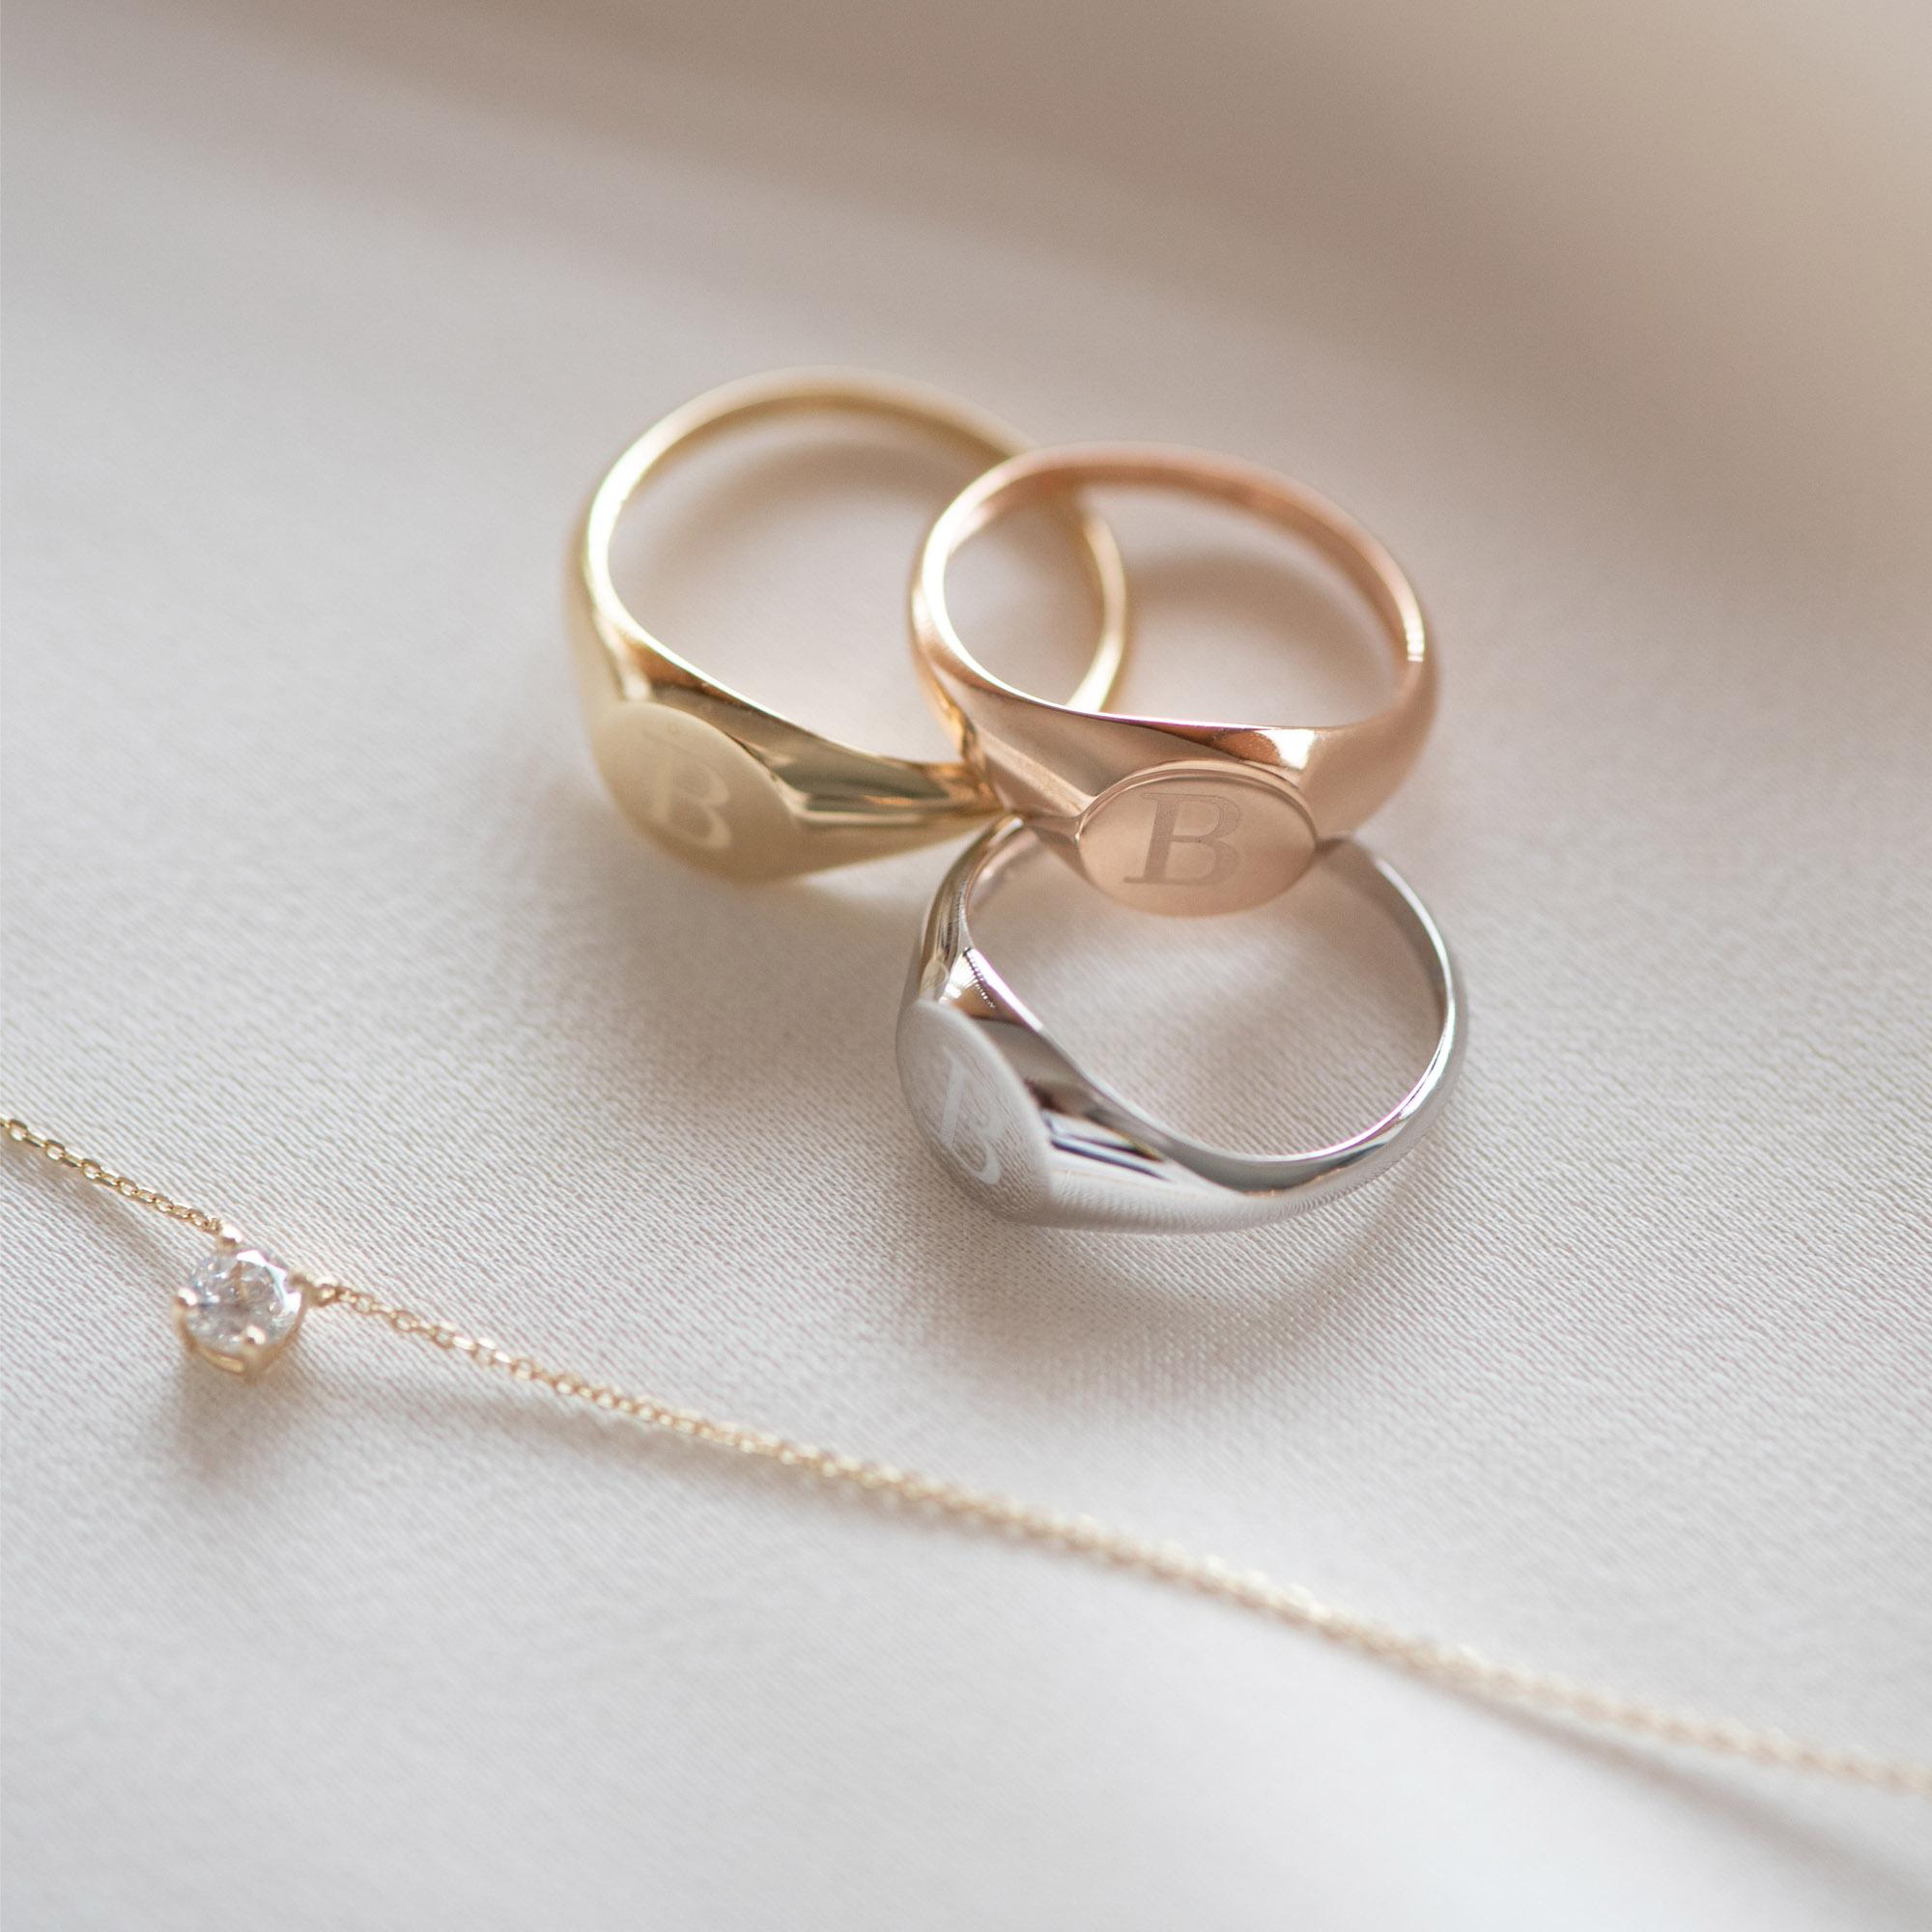 Isabel Bernard La Concorde Lauren 14 karat rose guld initial signet ring (56)